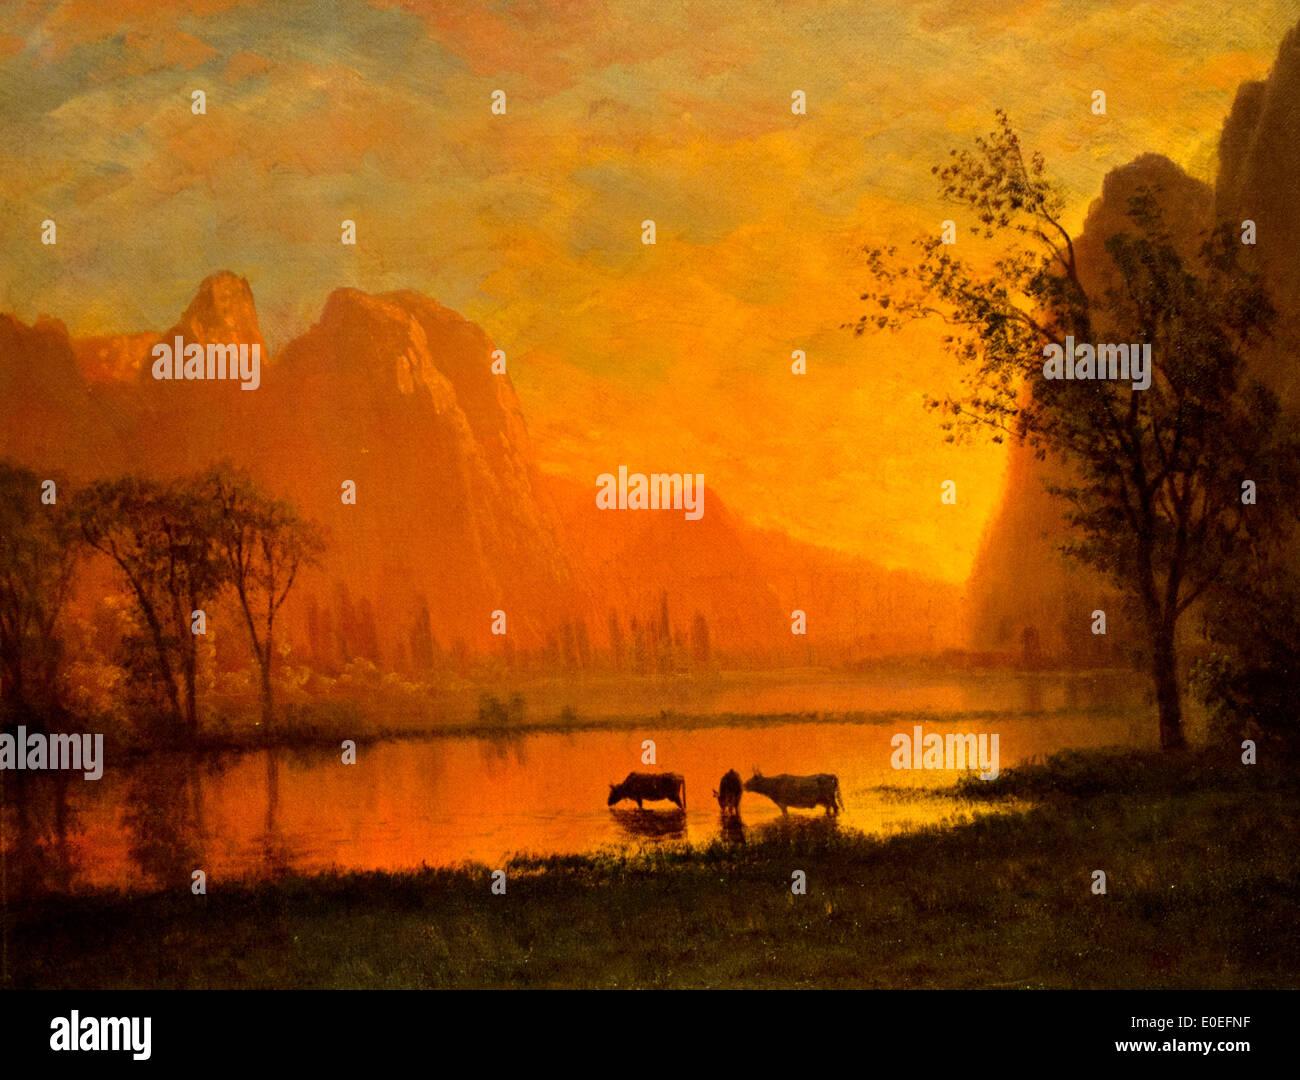 Sundown at Yosemite ca. 1863 Albert Bierstadt 1830-1902 German American Germany - Stock Image